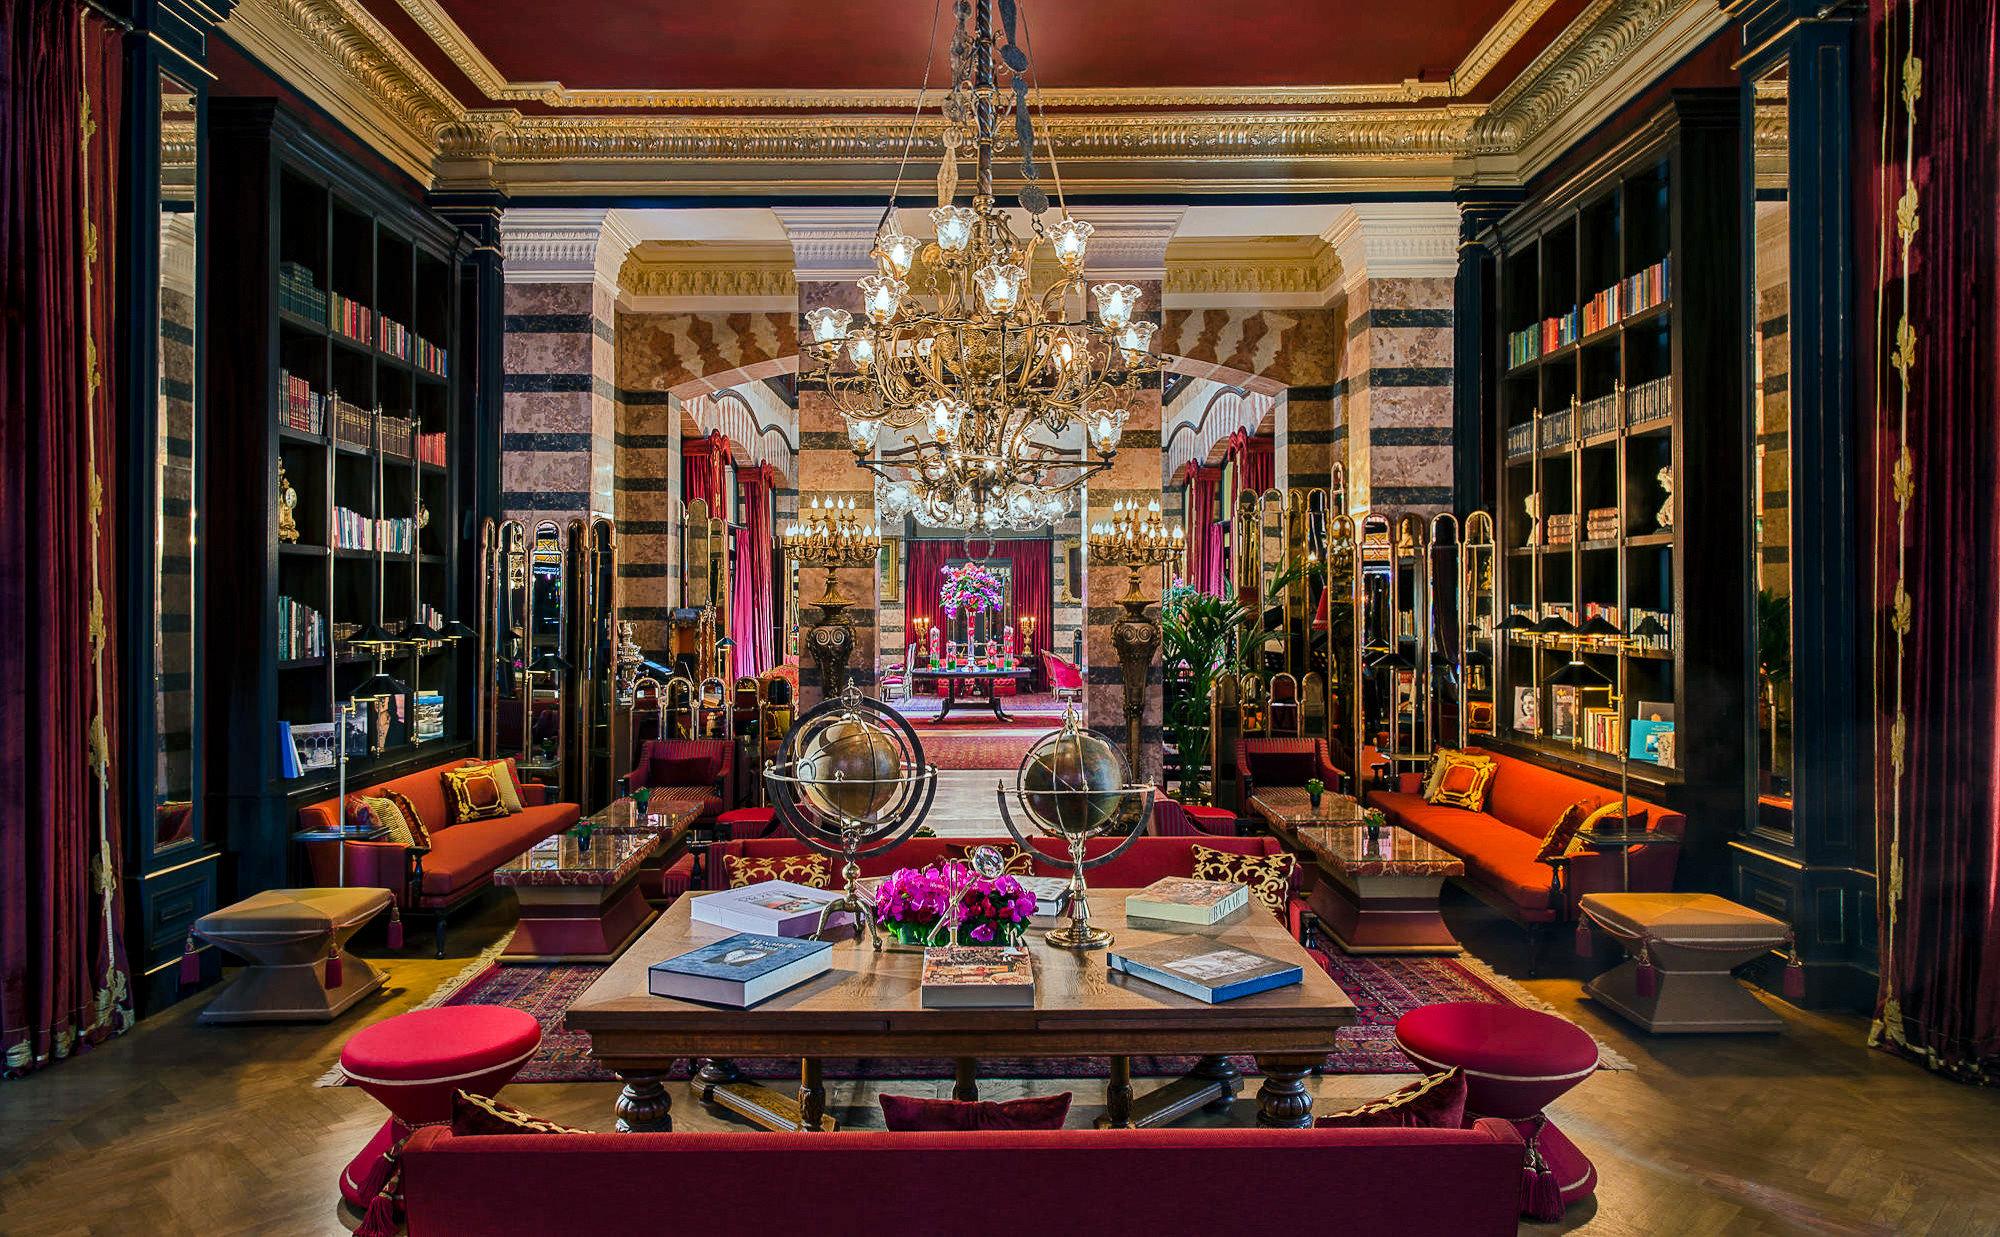 Boutique Hotels Hotels Luxury Travel floor interior design living room Lobby window